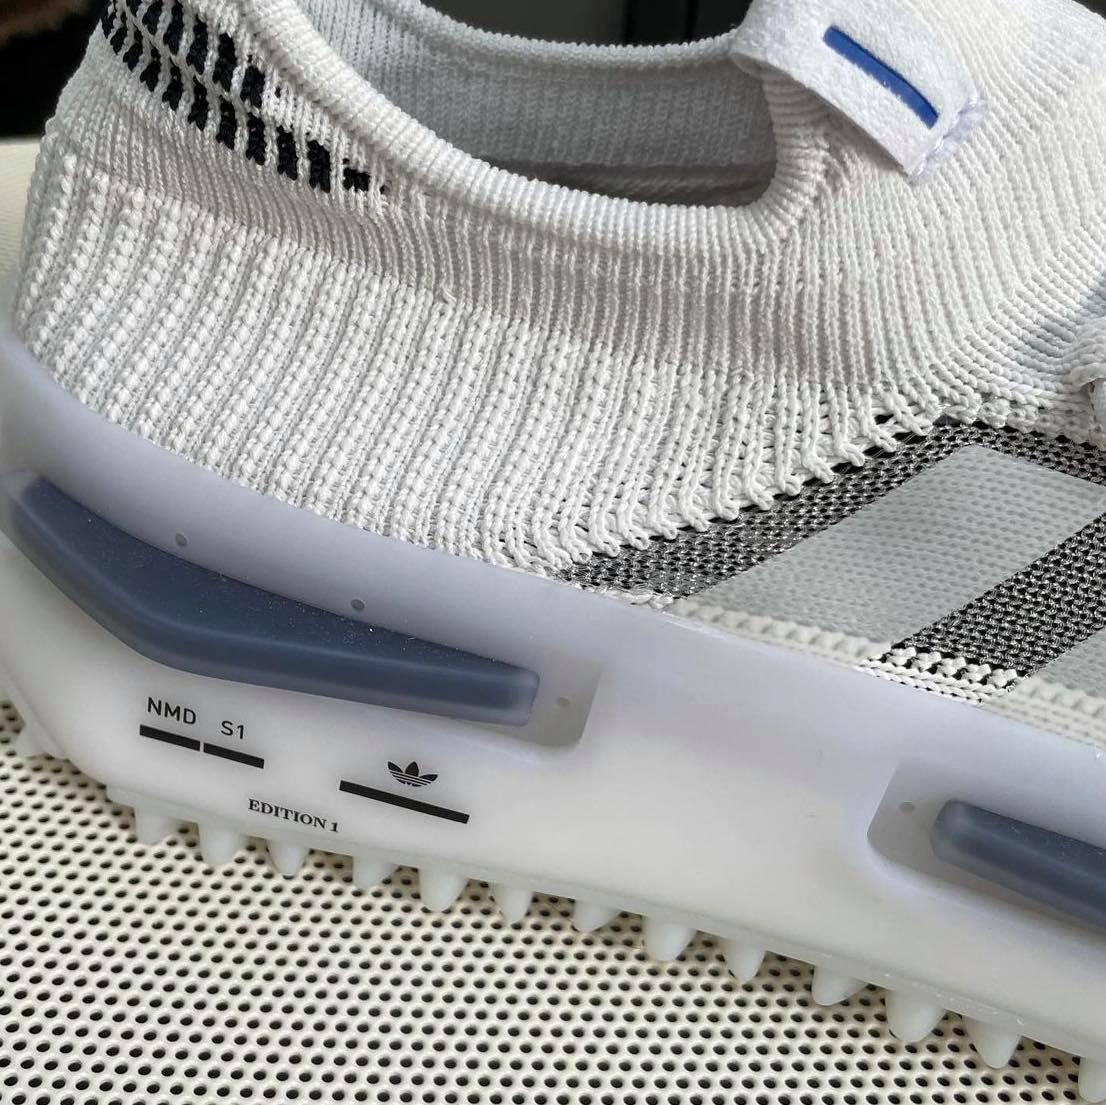 Adidas NMD S1